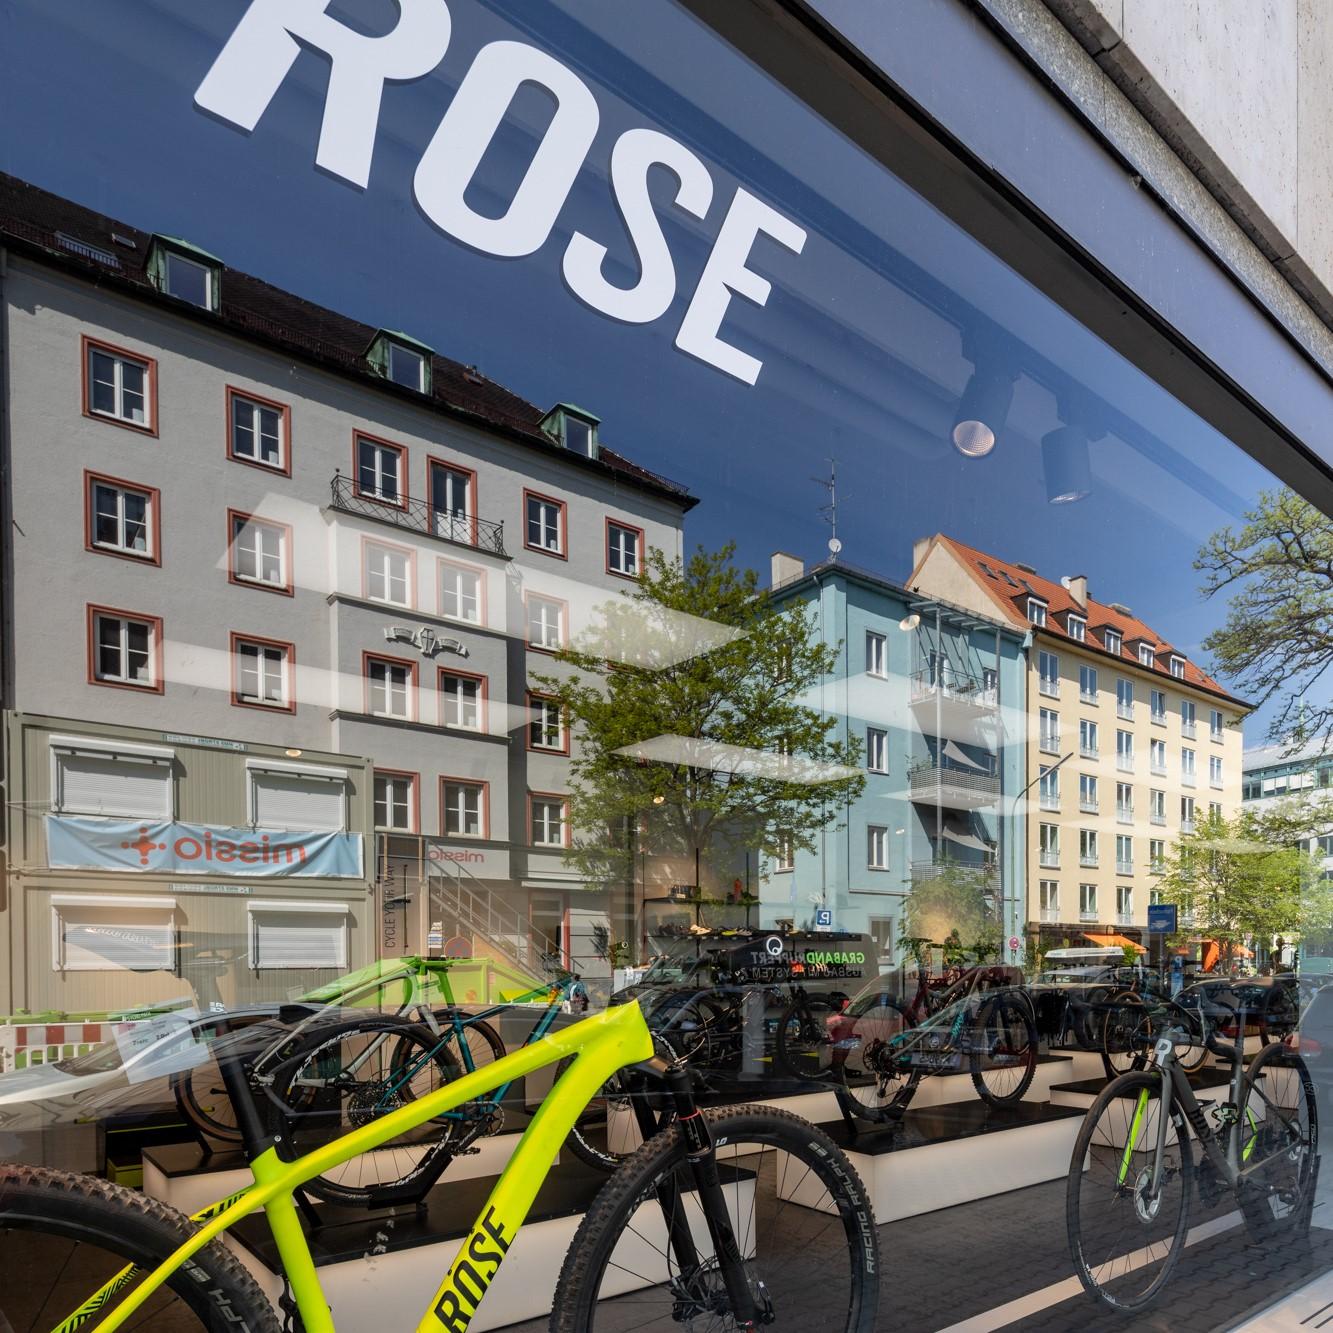 Rose Bike Muenchen